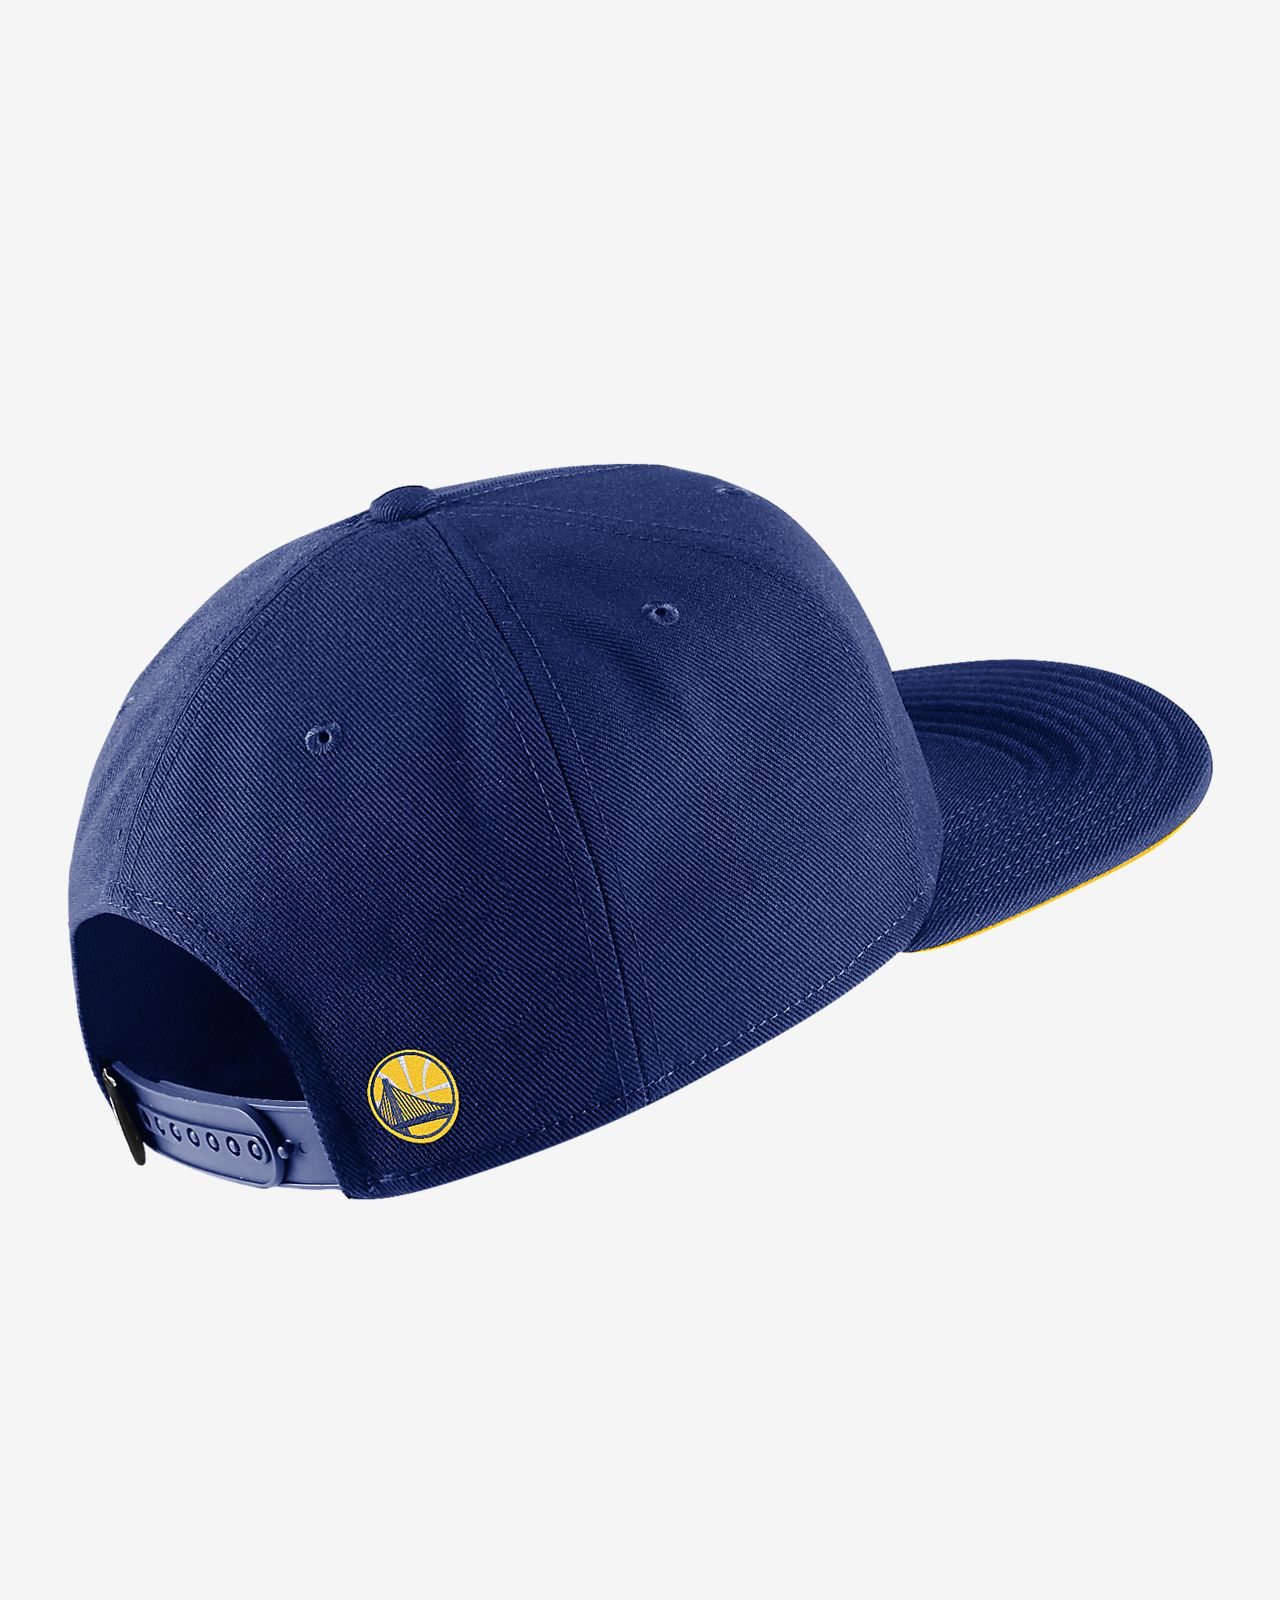 25b49b1ff77 Golden State Warriors Nike AeroBill NBA Hat. Nike.com VN